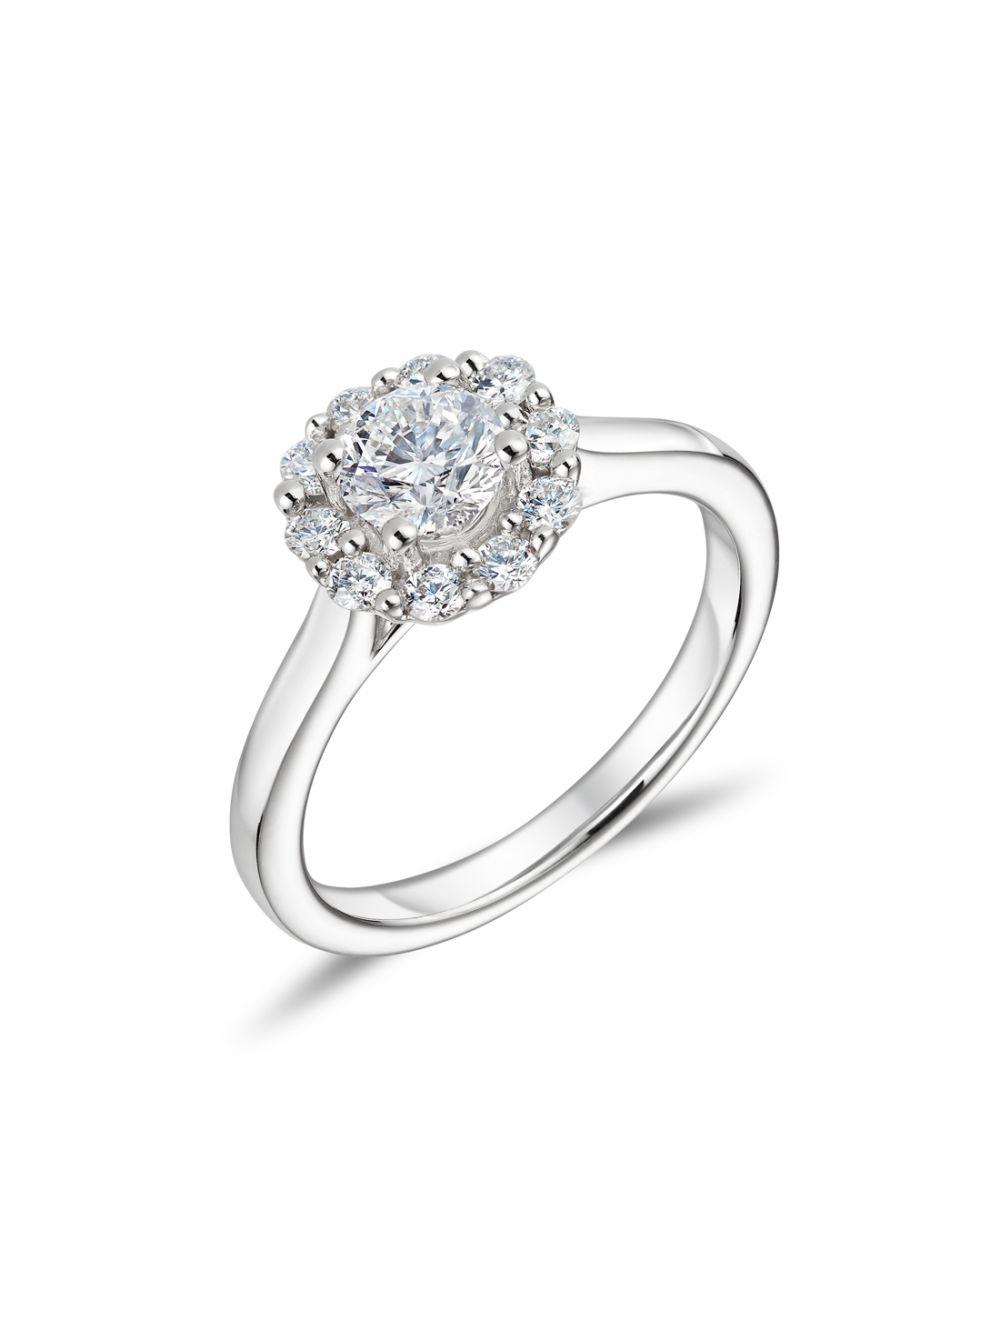 18Ct Round Brilliant Cut Diamond Engagement Ring Throughout Round Brilliant Diamond Engagement Rings (View 4 of 25)